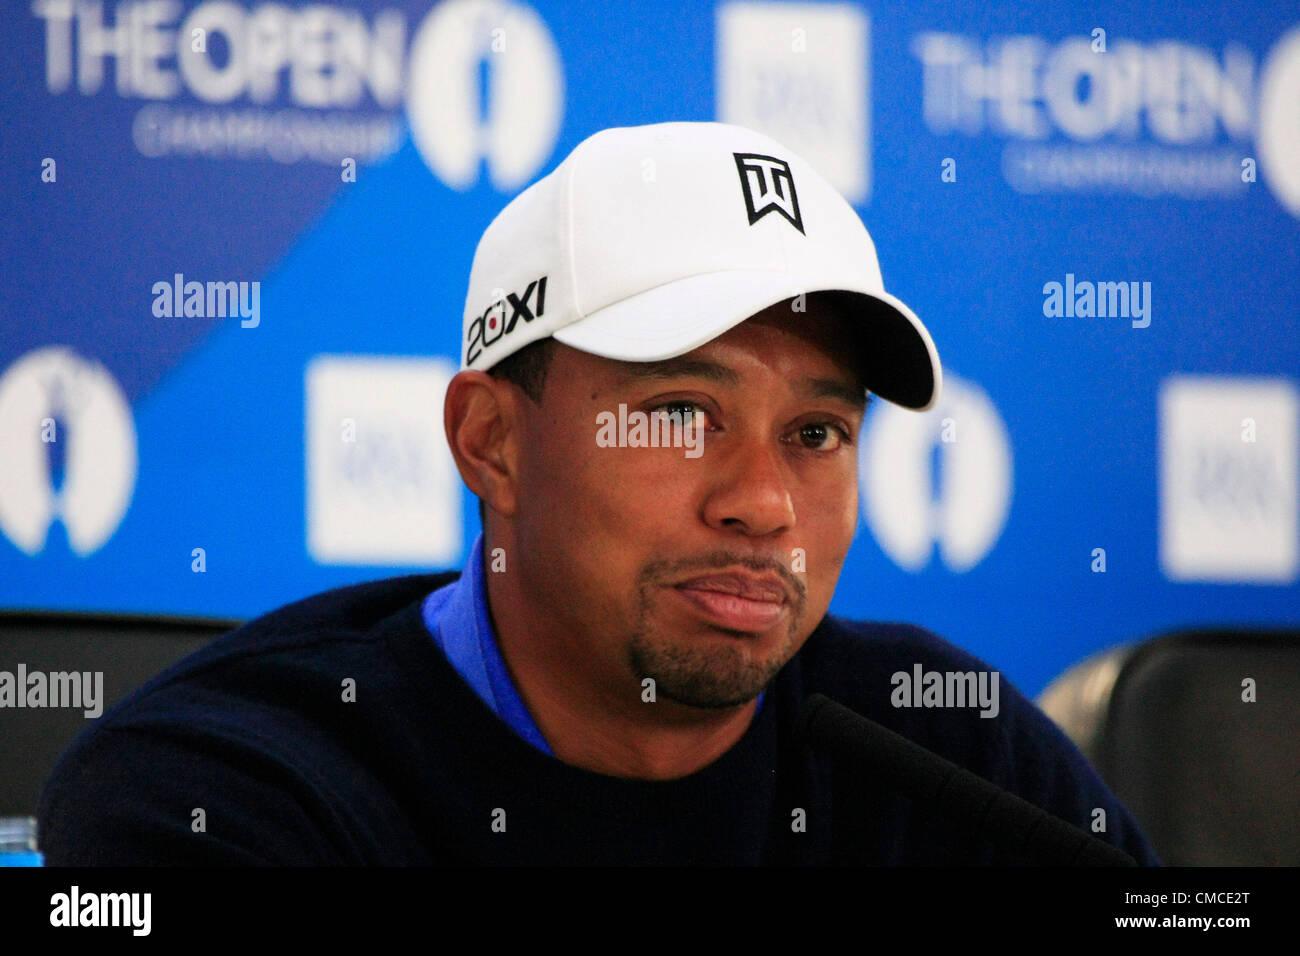 st annes golf club stock photos  u0026 st annes golf club stock